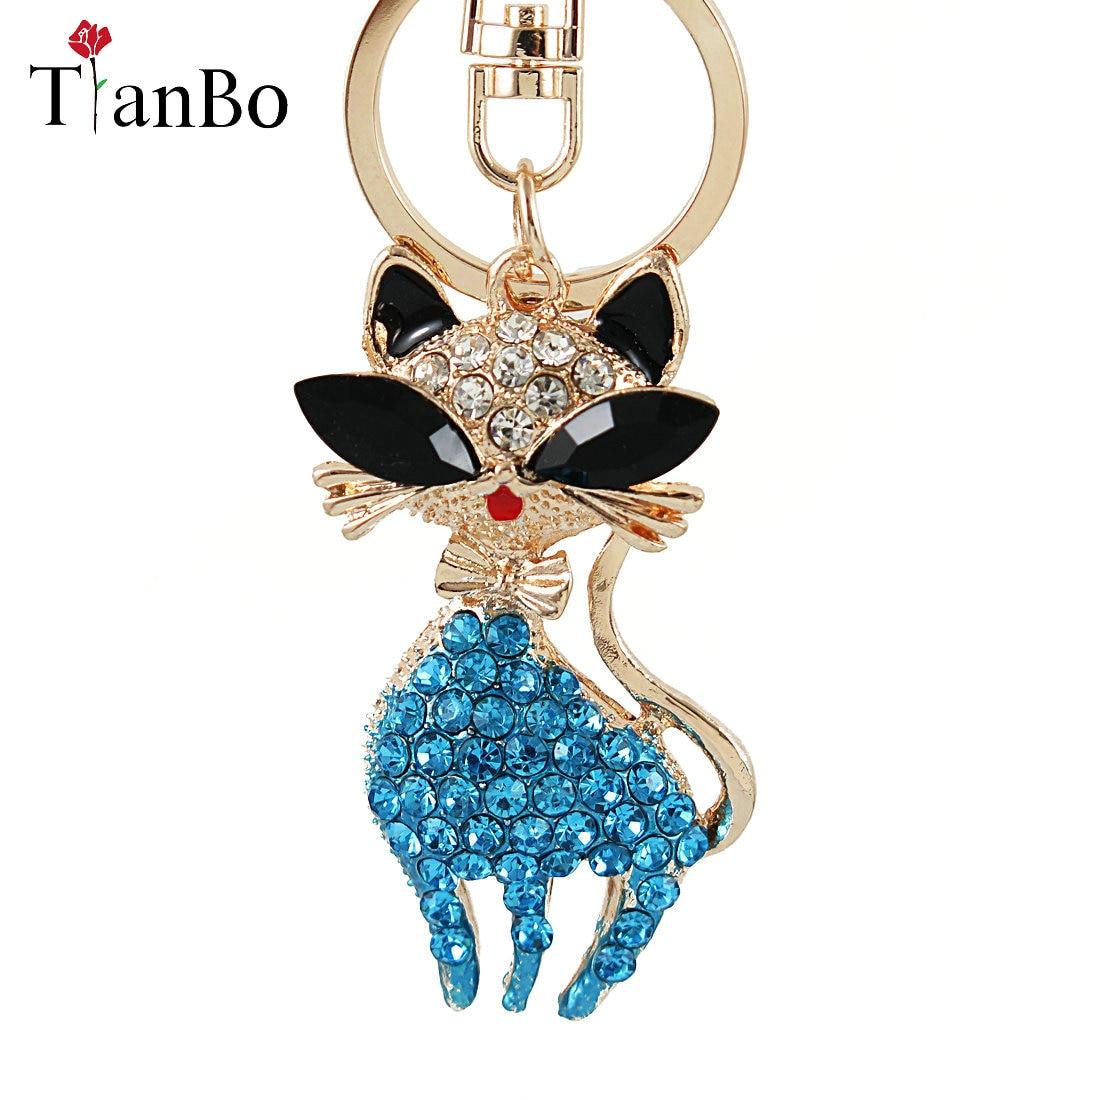 women bag charm trinket rhinestone animal Cat car key chain keyring bag key fobs holder keychains birthday gift souvenir jewelry